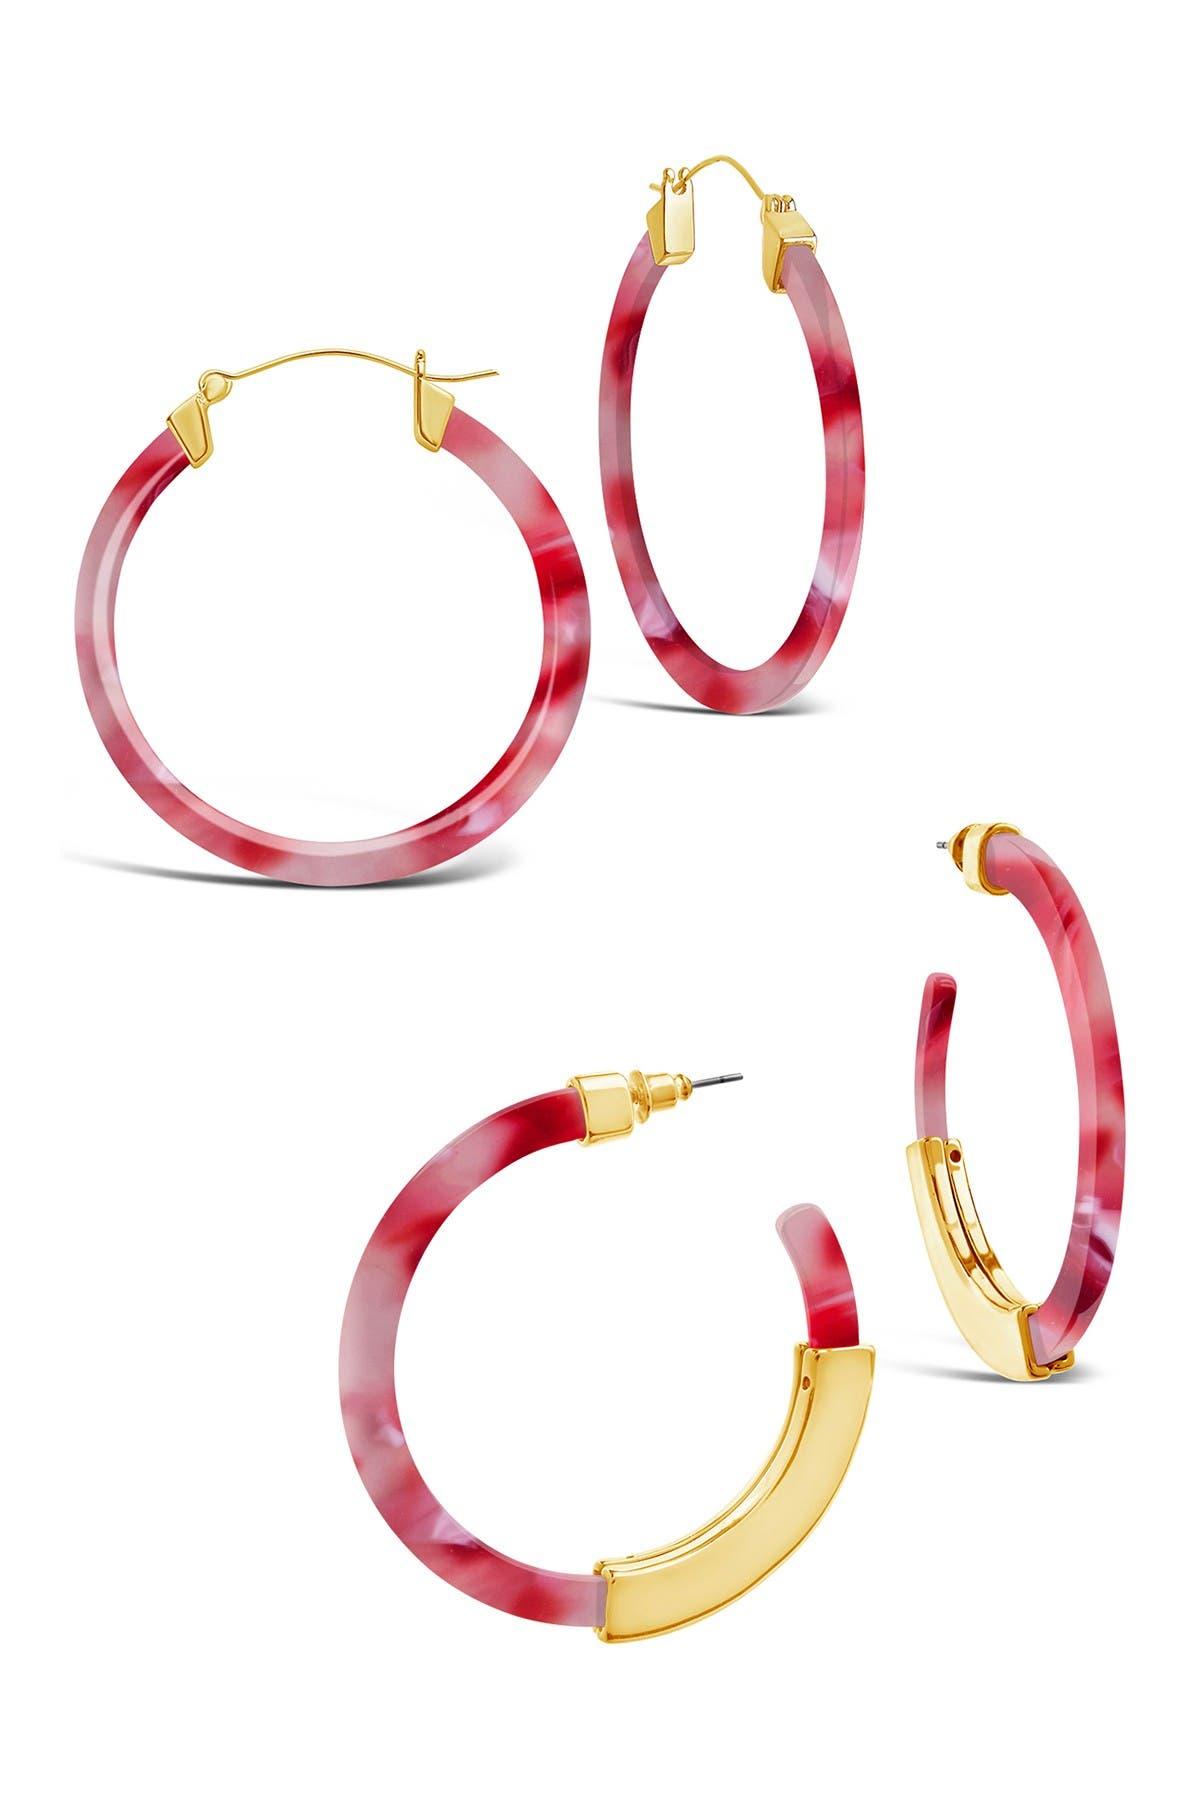 Image of Sterling Forever Strawberry Resin 50mm Hoop Earrings - Set of 2